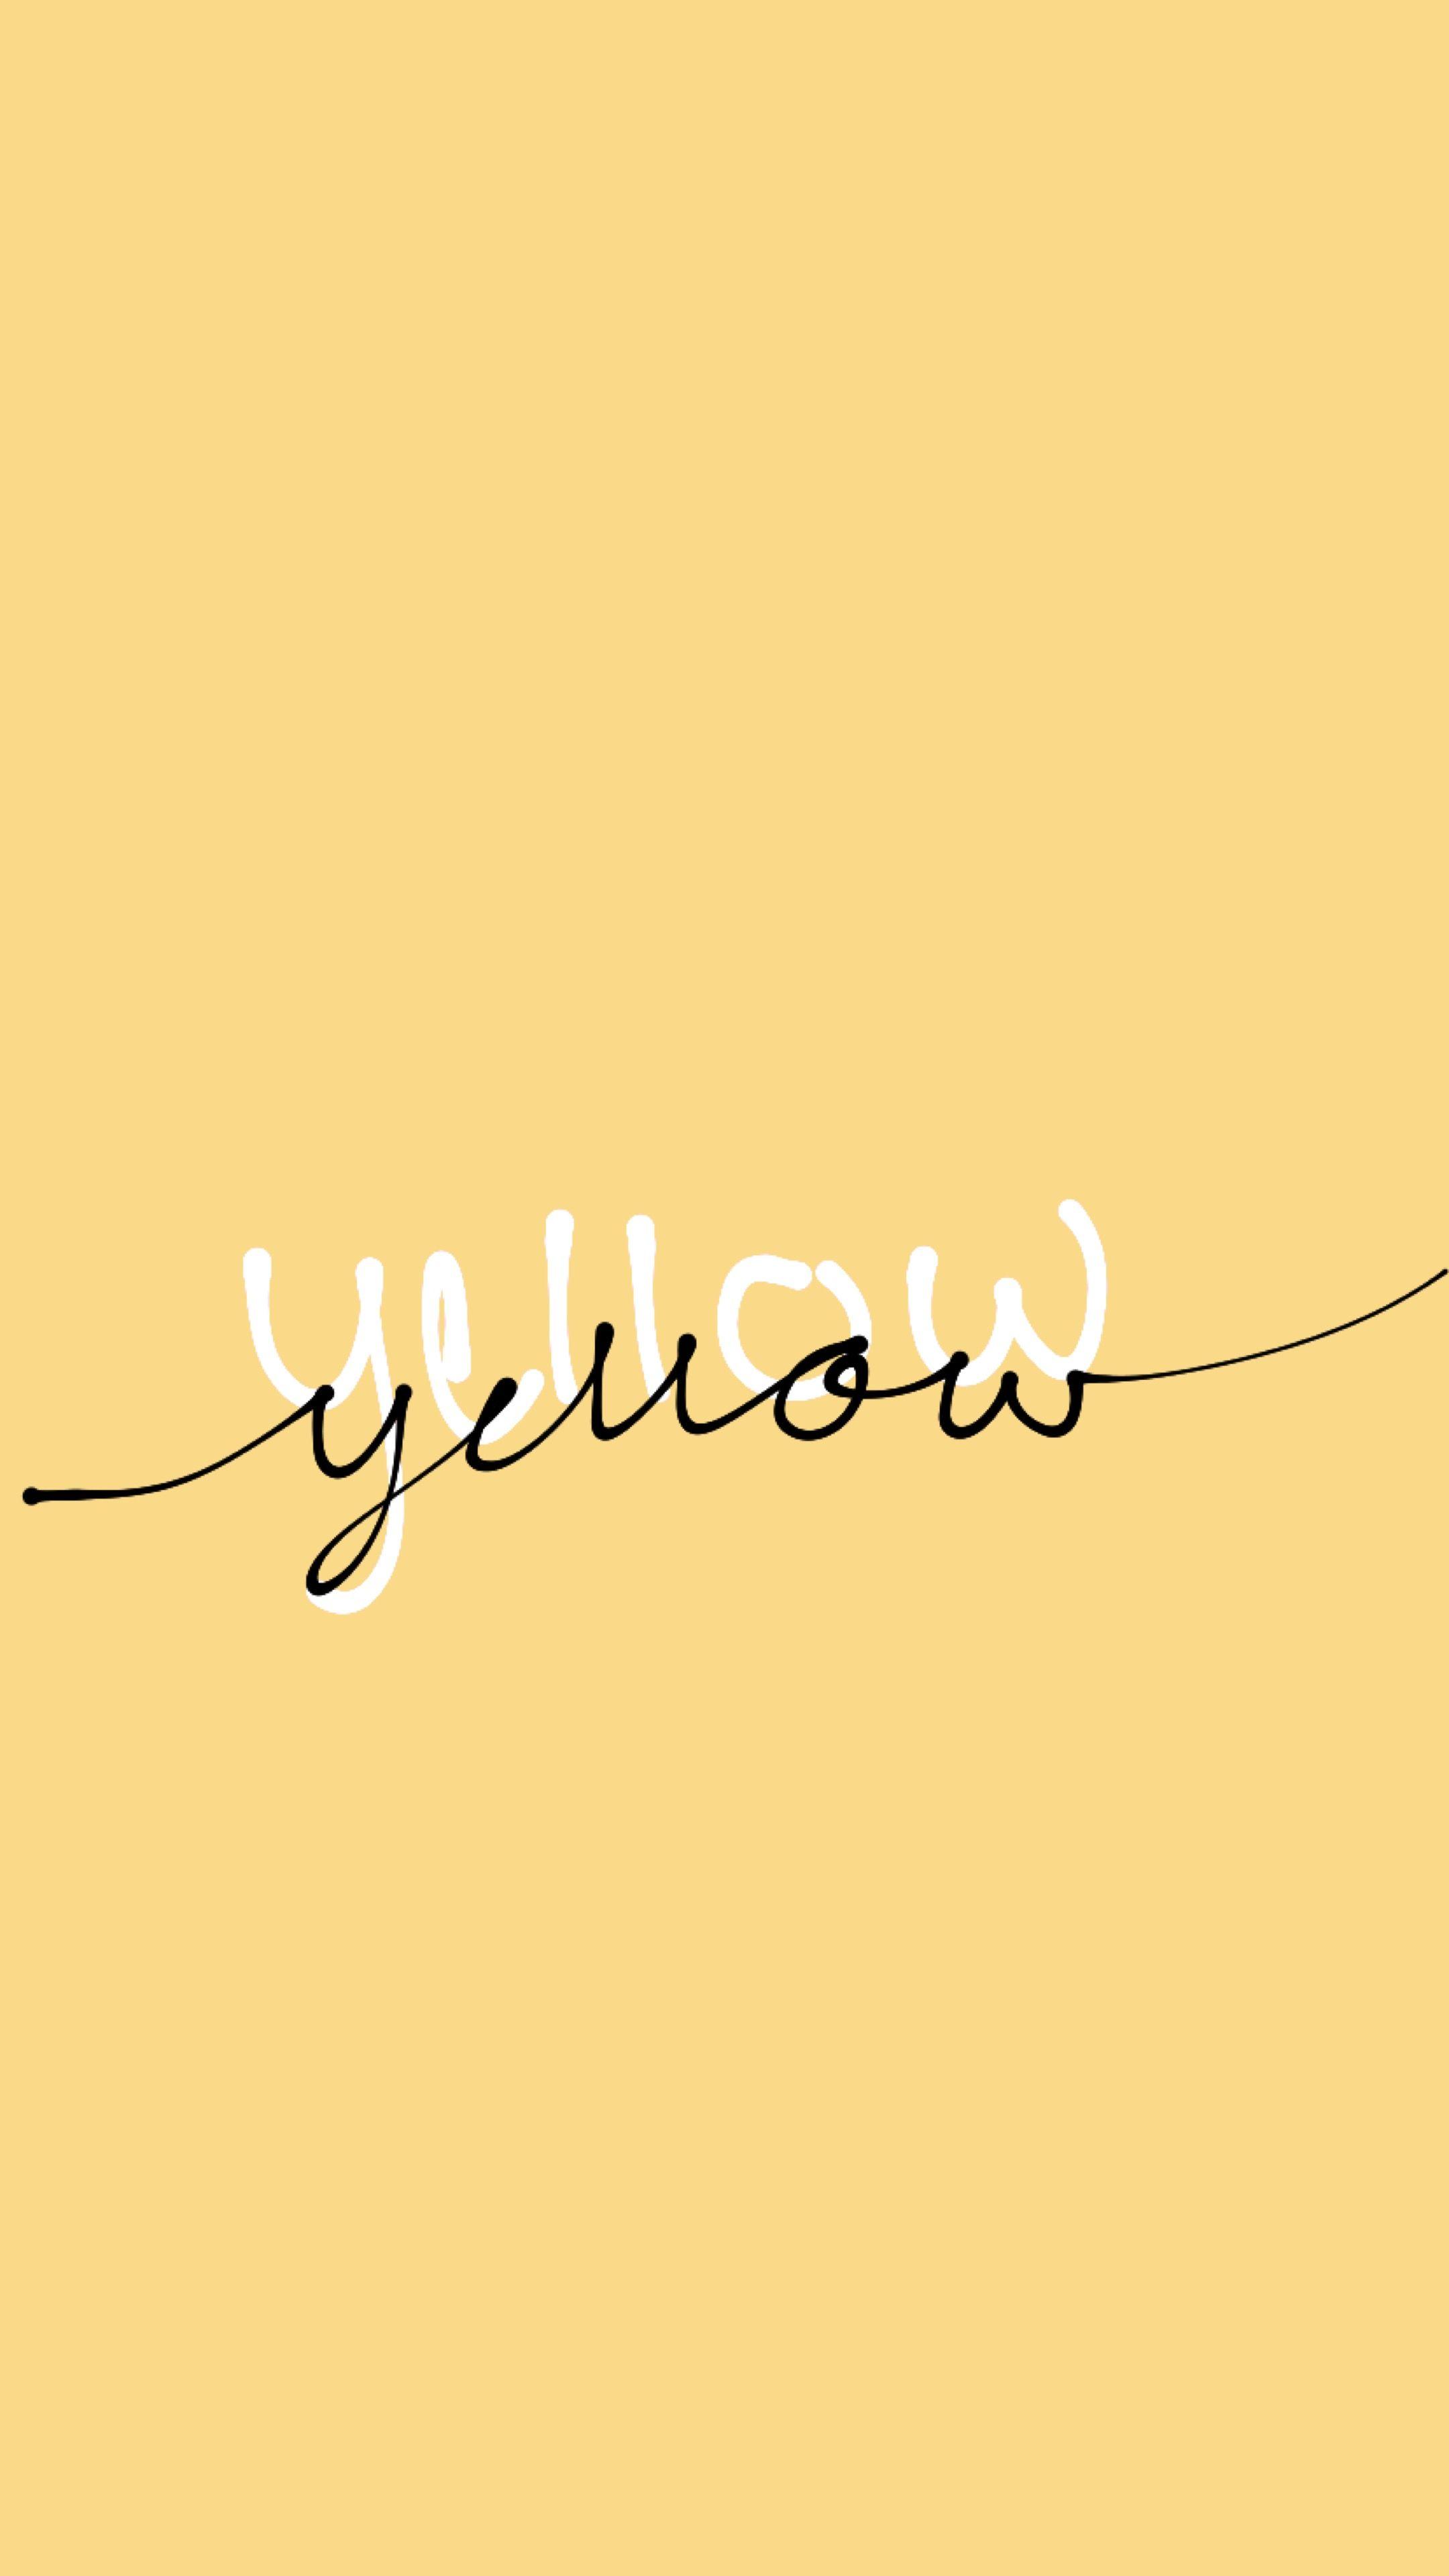 Pin By Liliana Bajacan On Wallpaper In 2019 Yellow